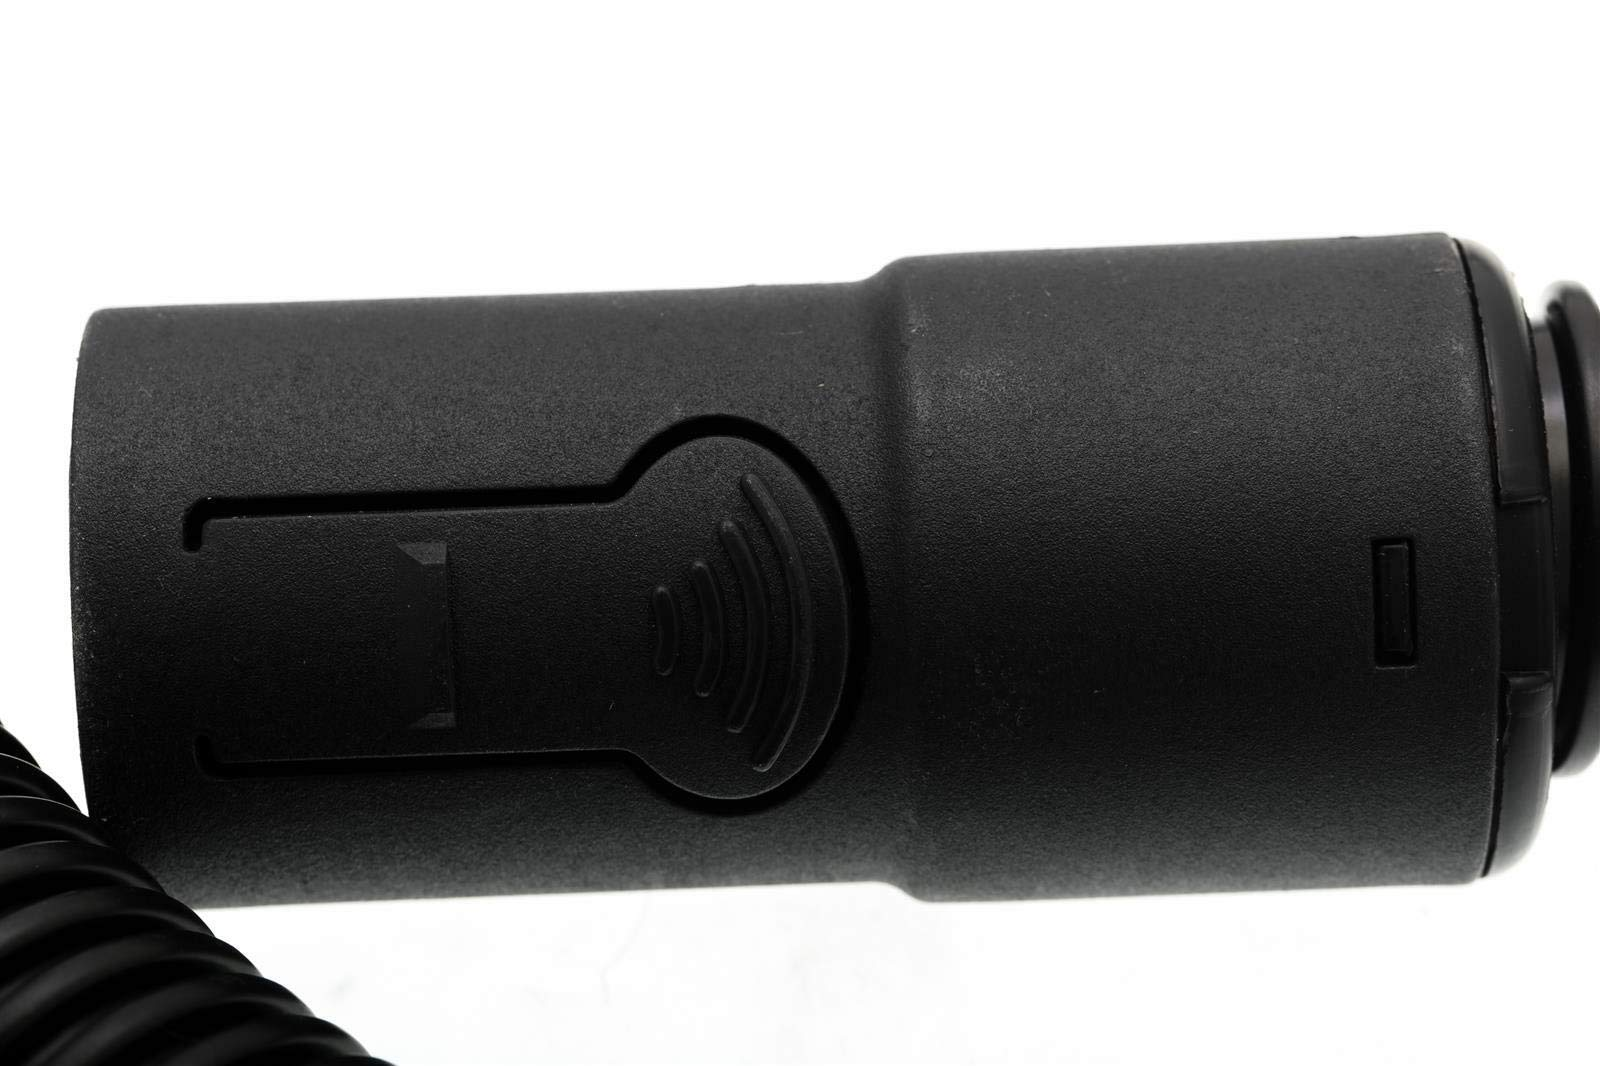 Cleanwizzard - Manguera para aspiradora Bosch Sphera, Siemens Dino (diámetro 35 mm, 1,8 m): Amazon.es: Hogar